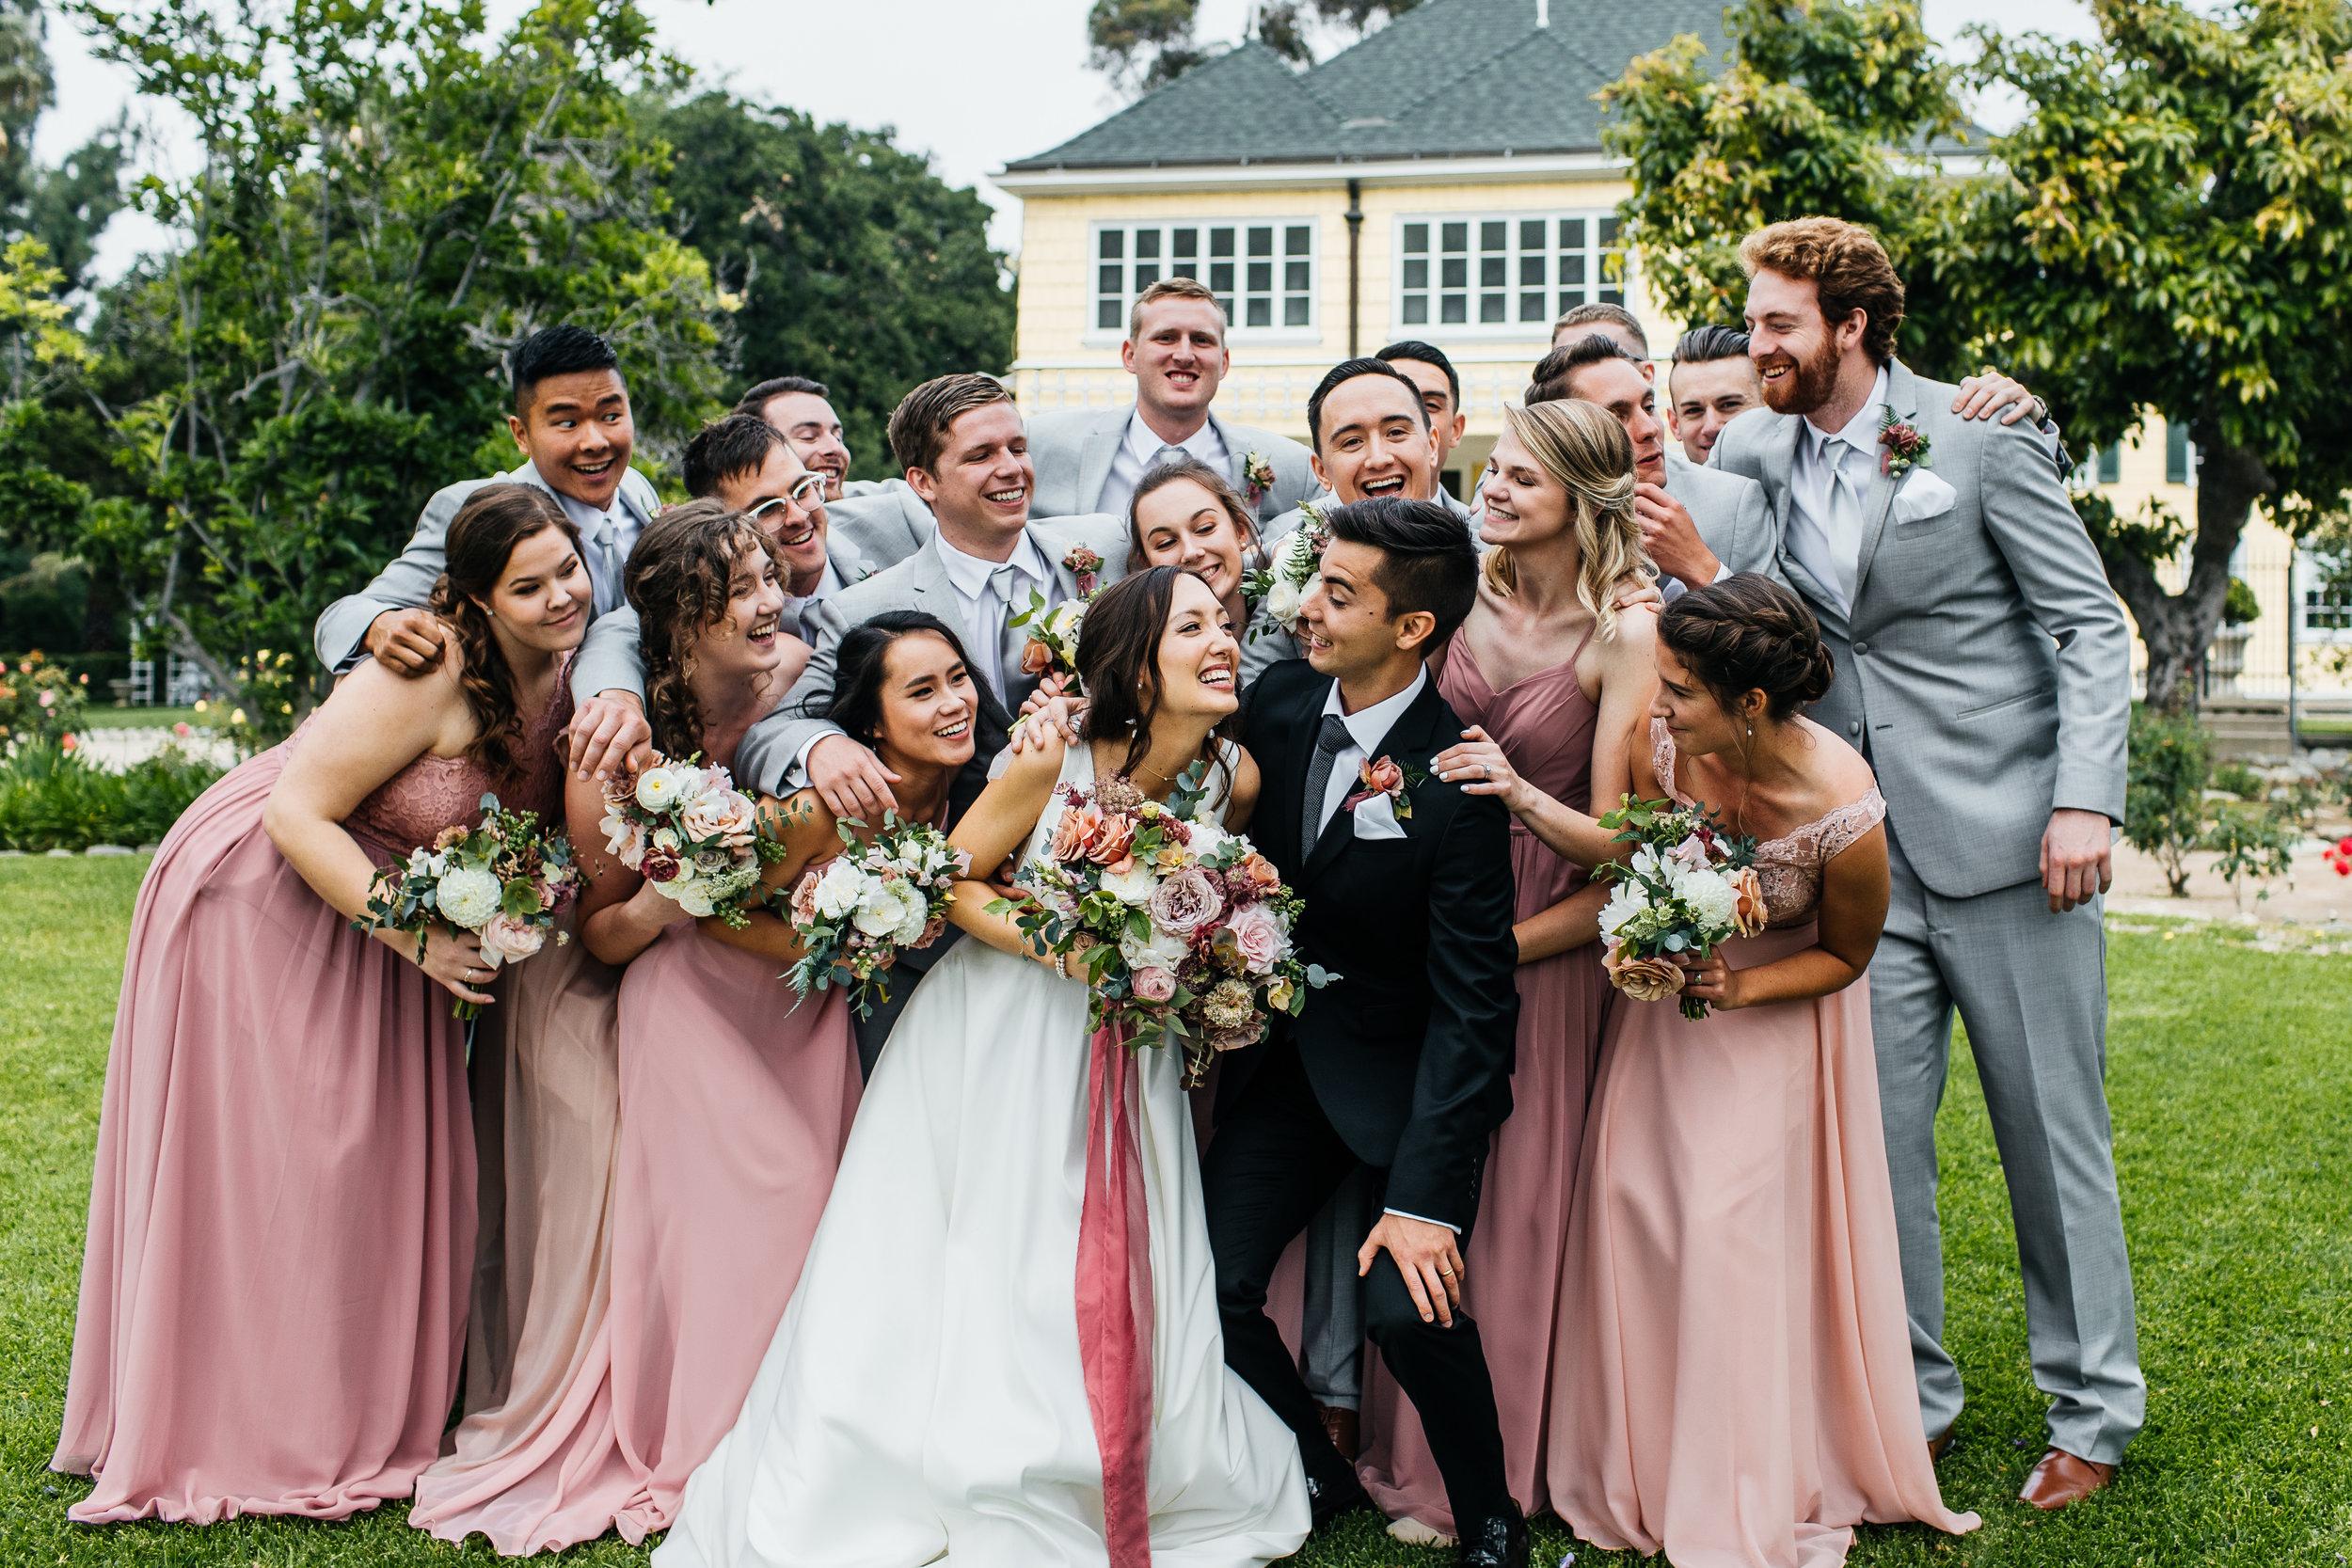 Emma + Eliot's Wedding by Erin Marton-348.jpg